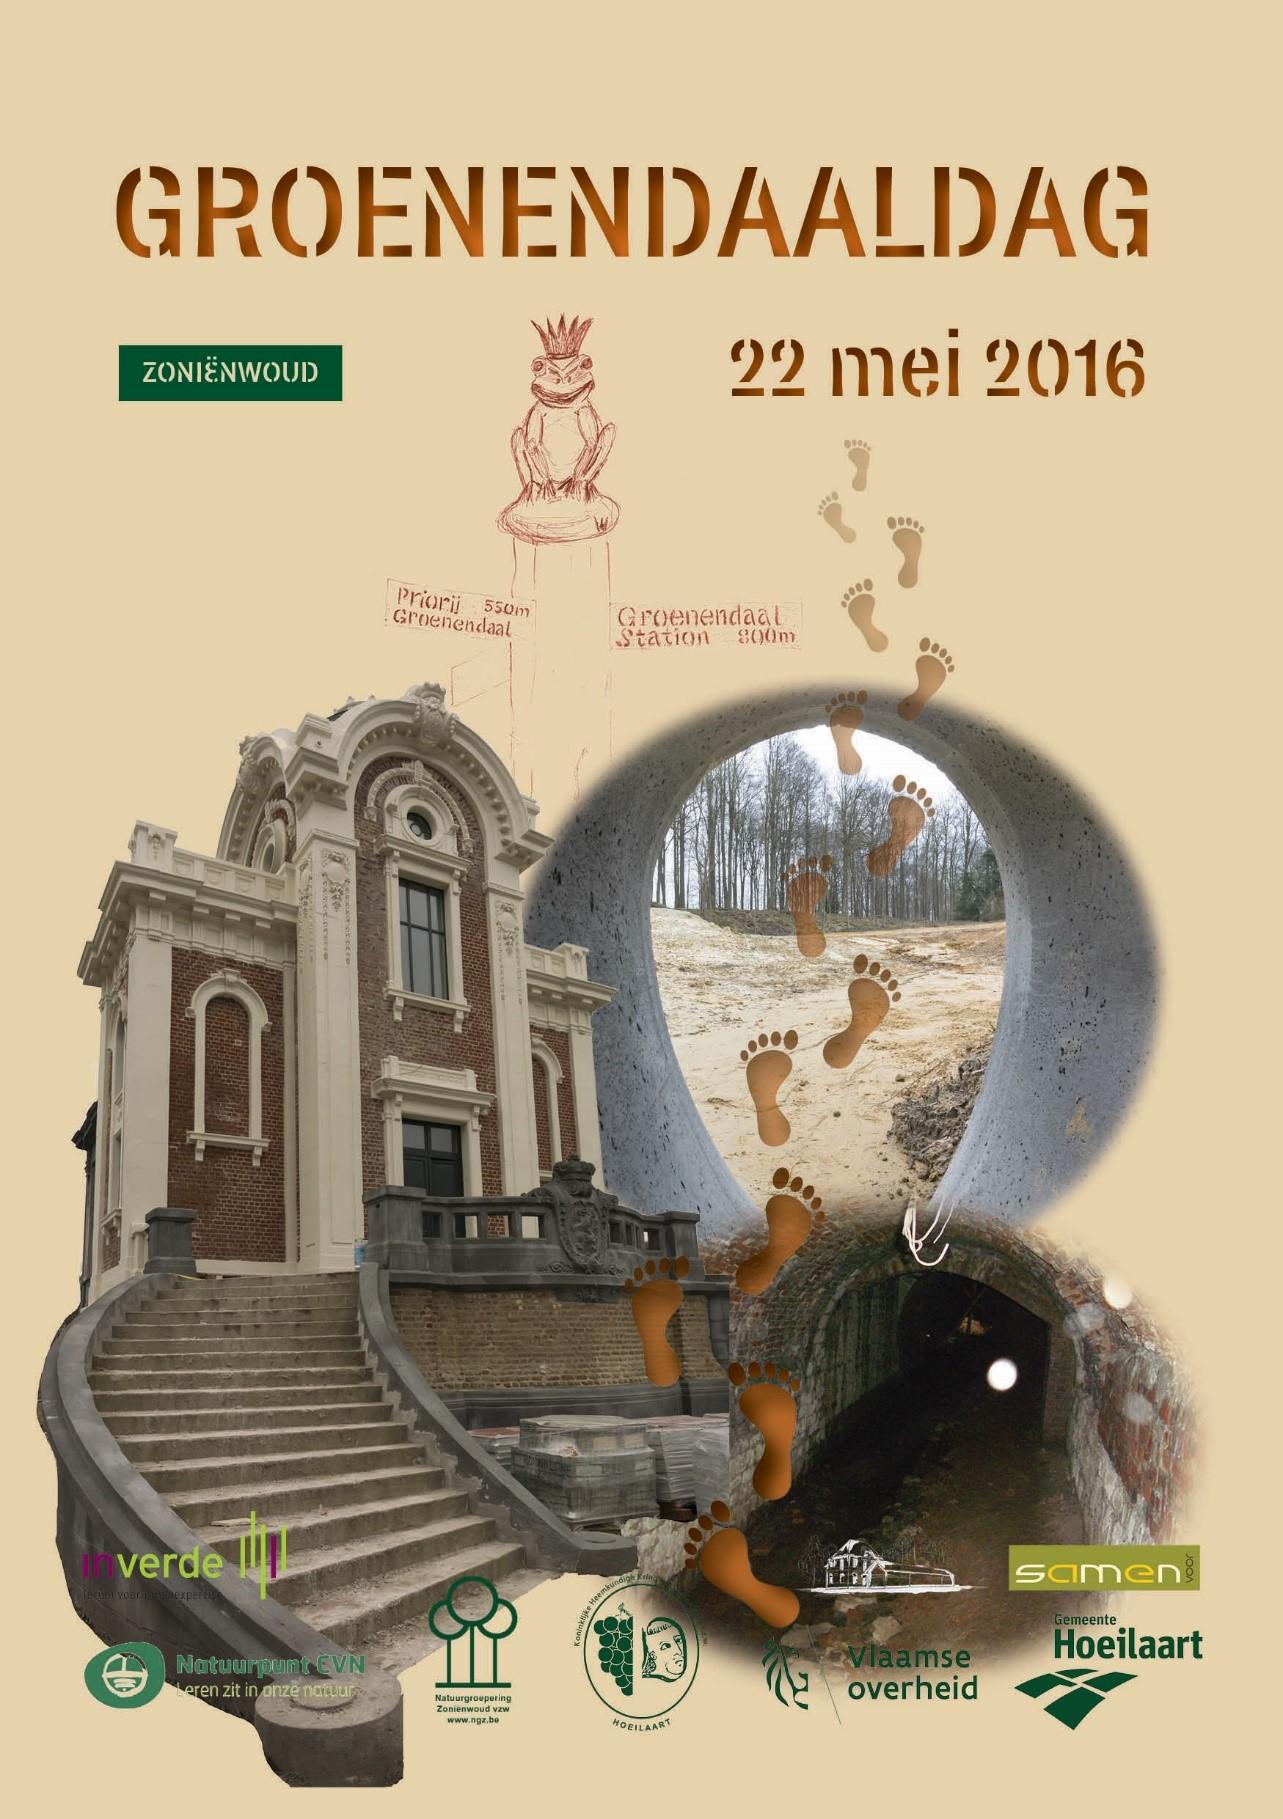 Affiche Groenendaaldag 22 mei 2016